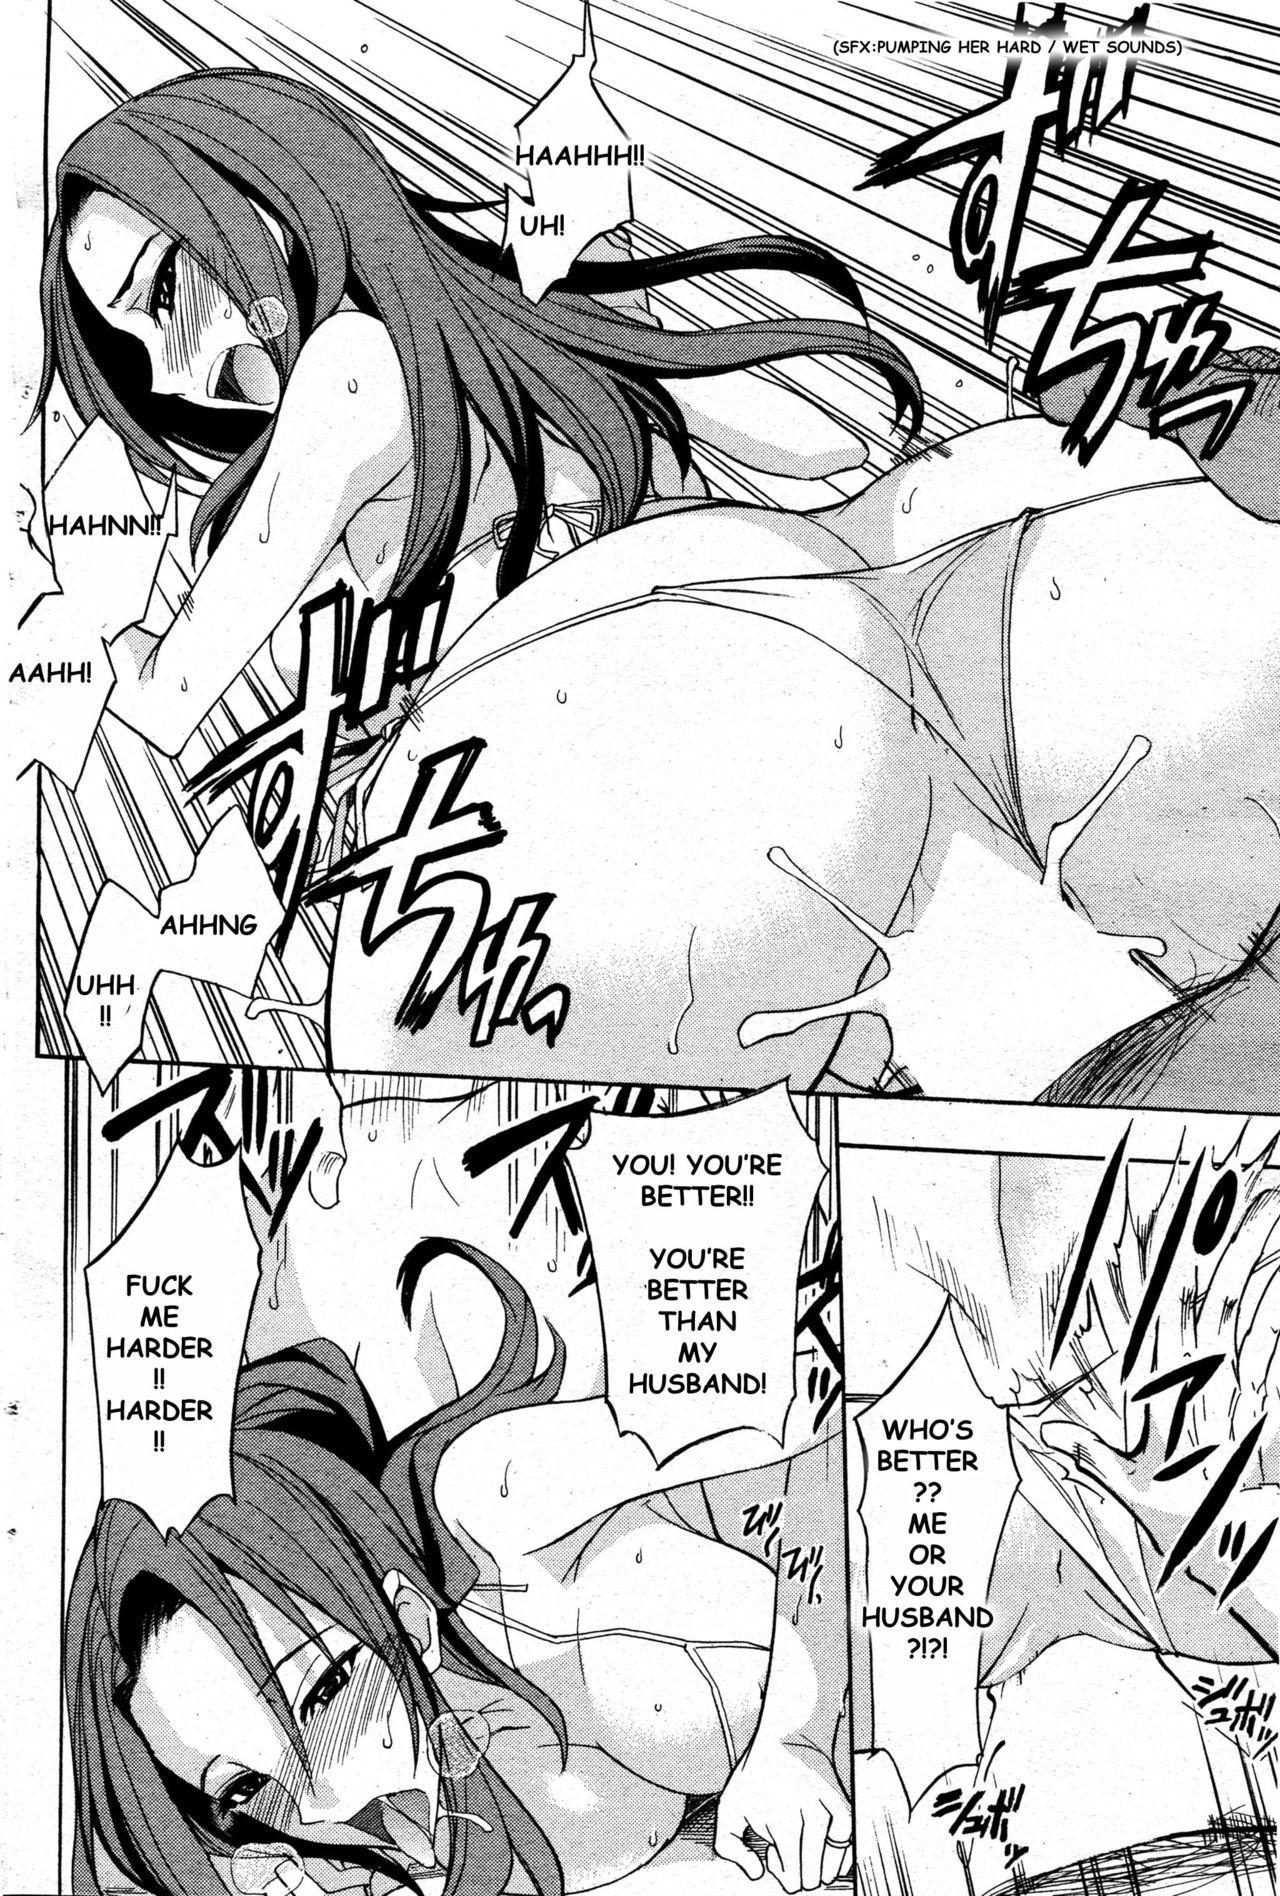 Okusan no Himitsu | A Wife's Secret 11